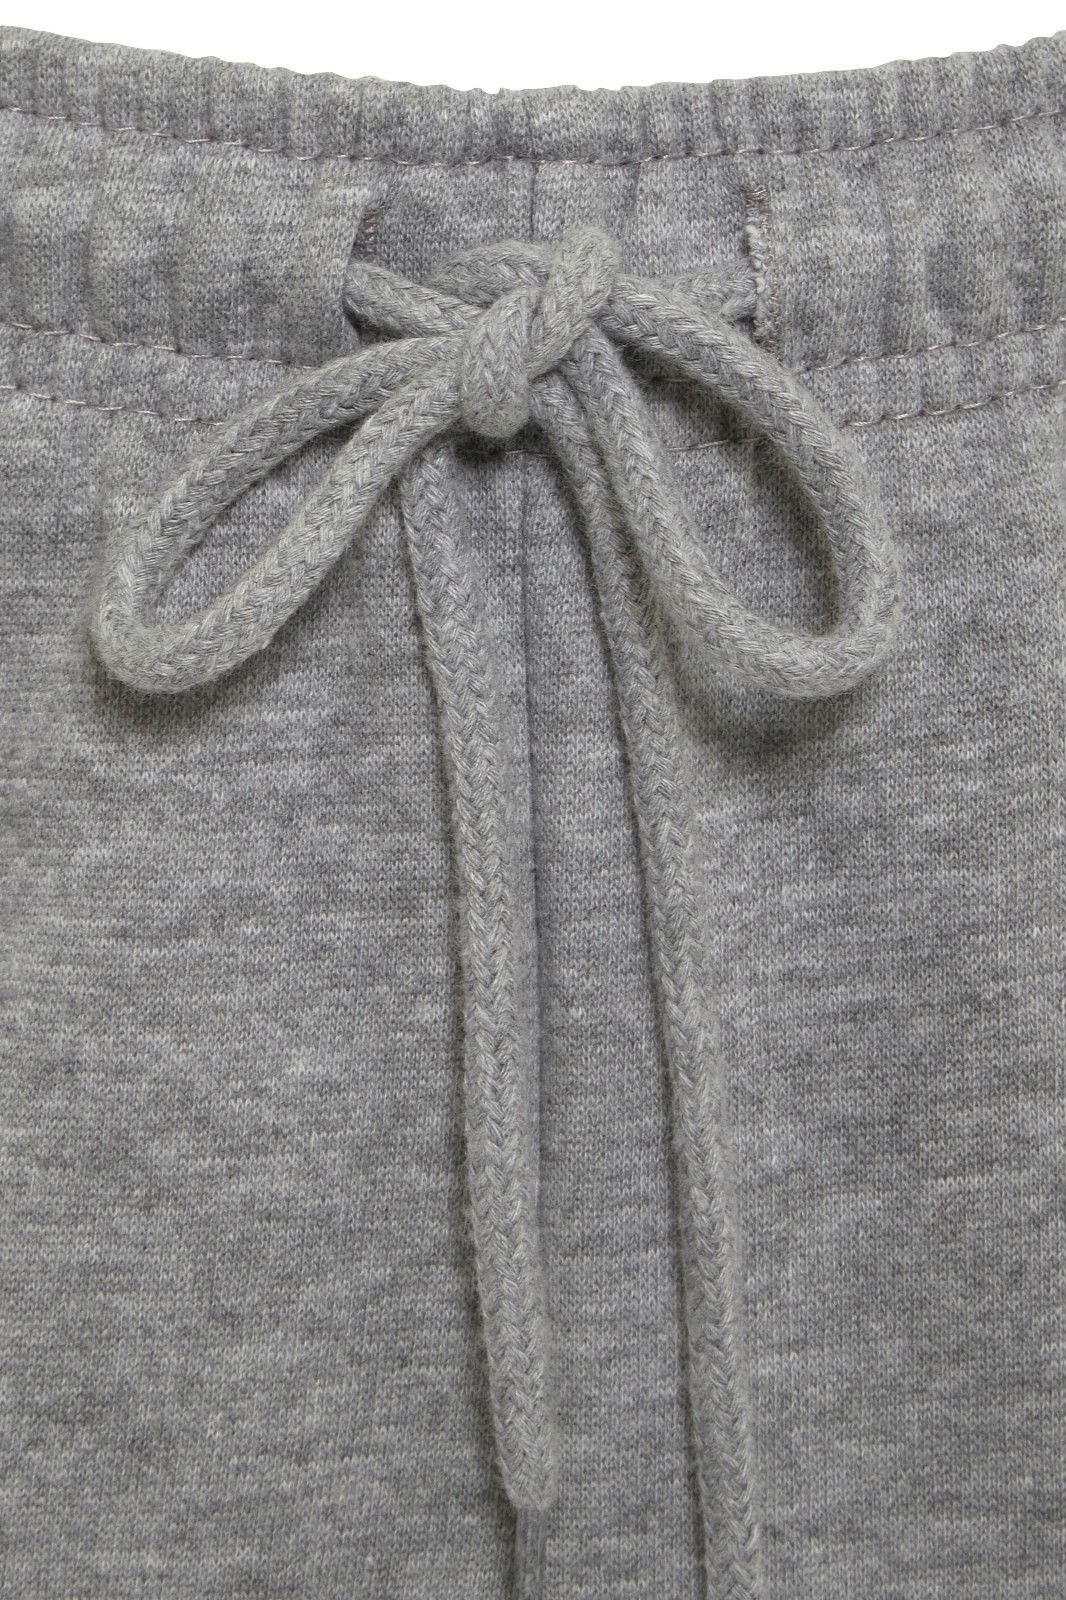 Uomo-Casual-Tinta-Unita-Pantaloni-sportivi-Bottoms-Apri-Hem-Sudore-Pantaloni-Tasche-Con-Zip miniatura 10